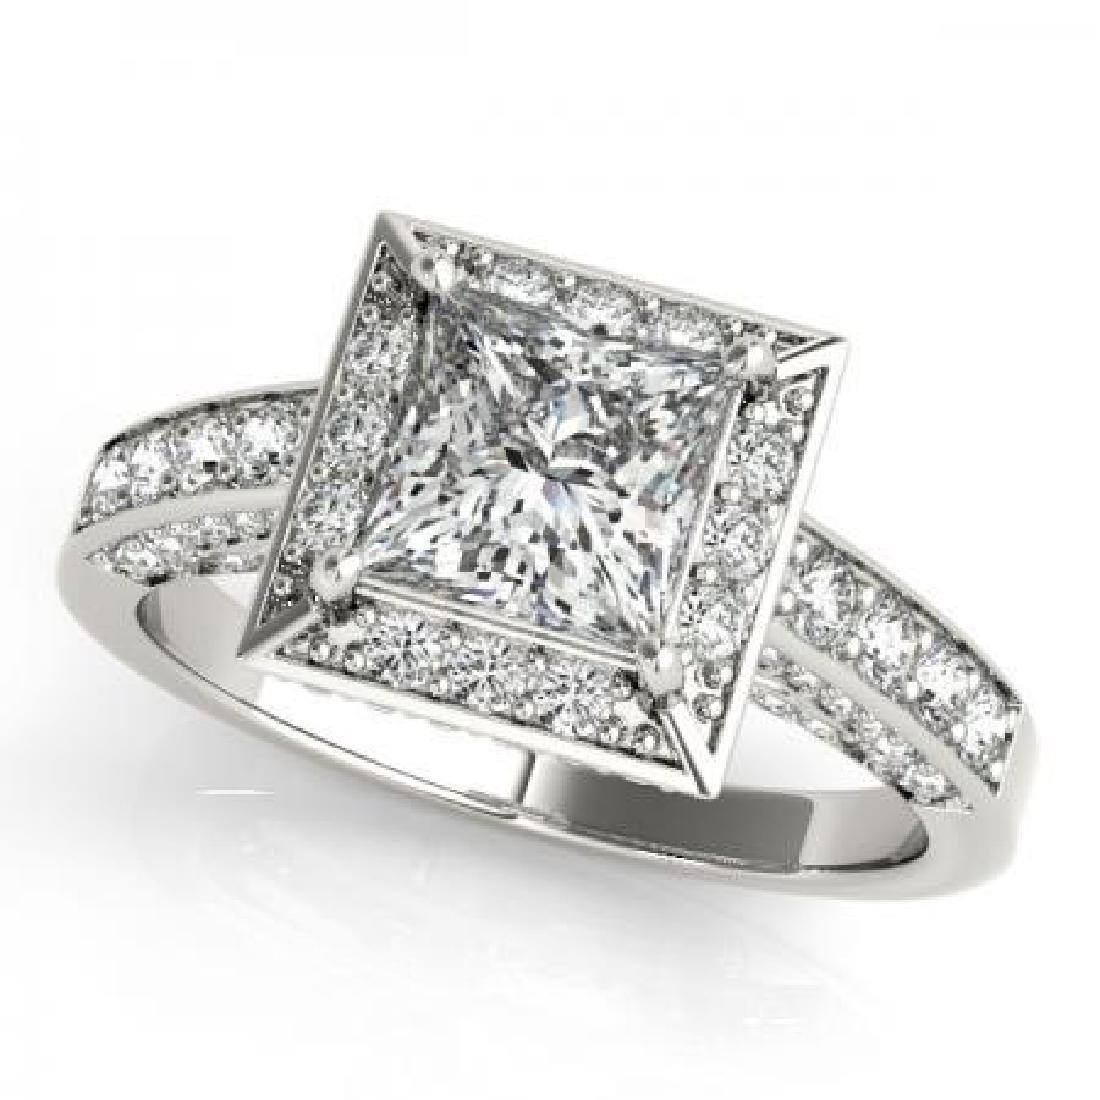 CERTIFIED 18KT WHITE GOLD 1.25 CT G-H/VS-SI1 DIAMOND HA